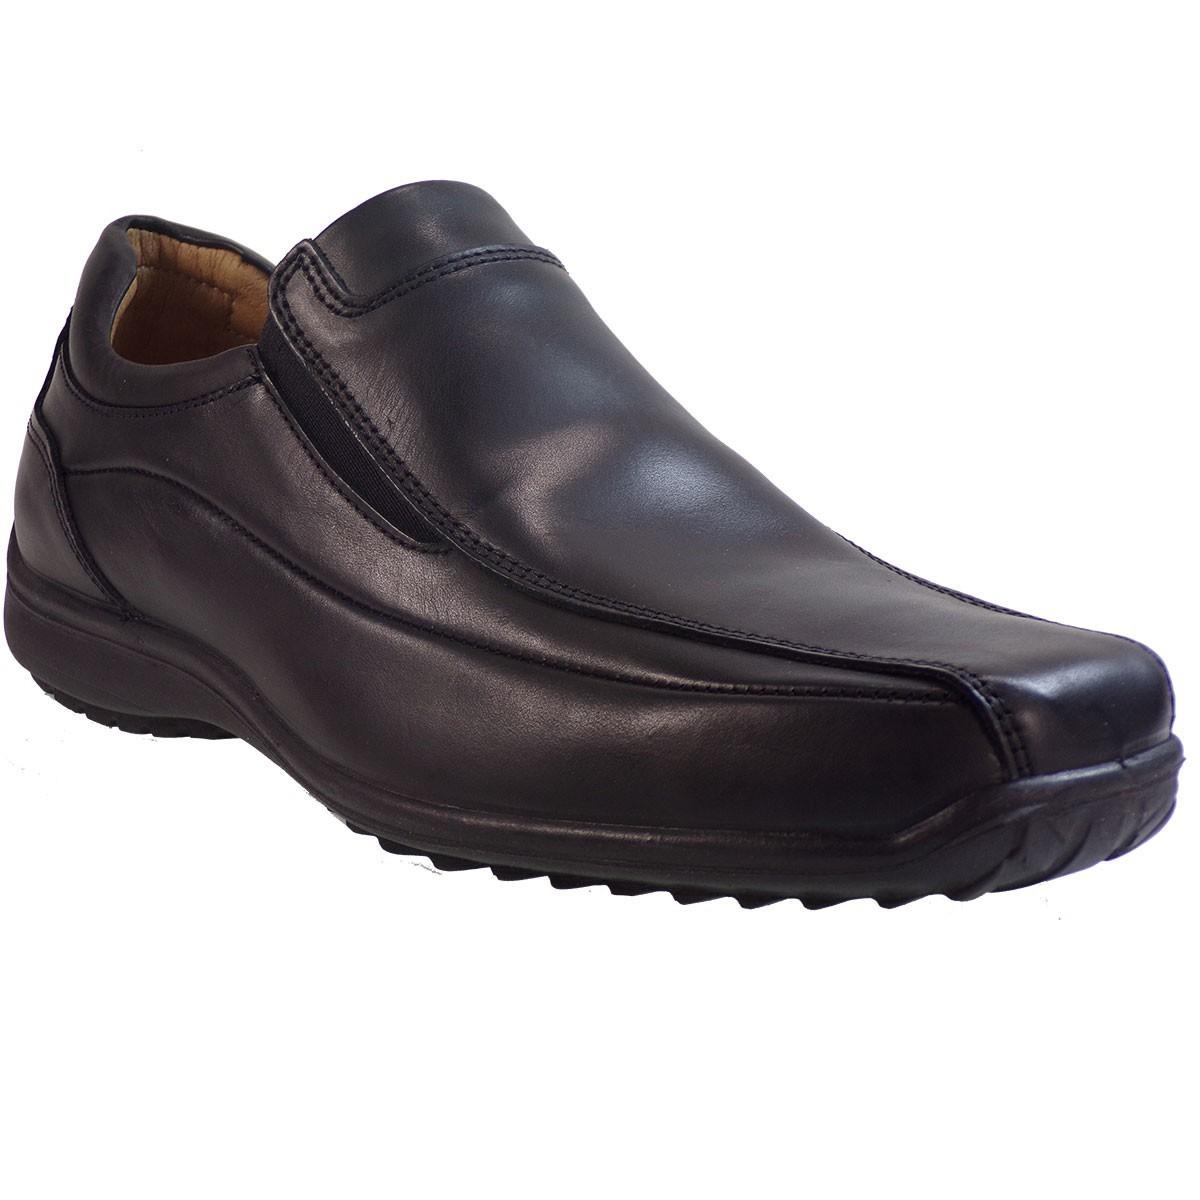 Aeropelma Duetto Ανδρικά Παπούτσια 671 Μαύρο Δέρμα